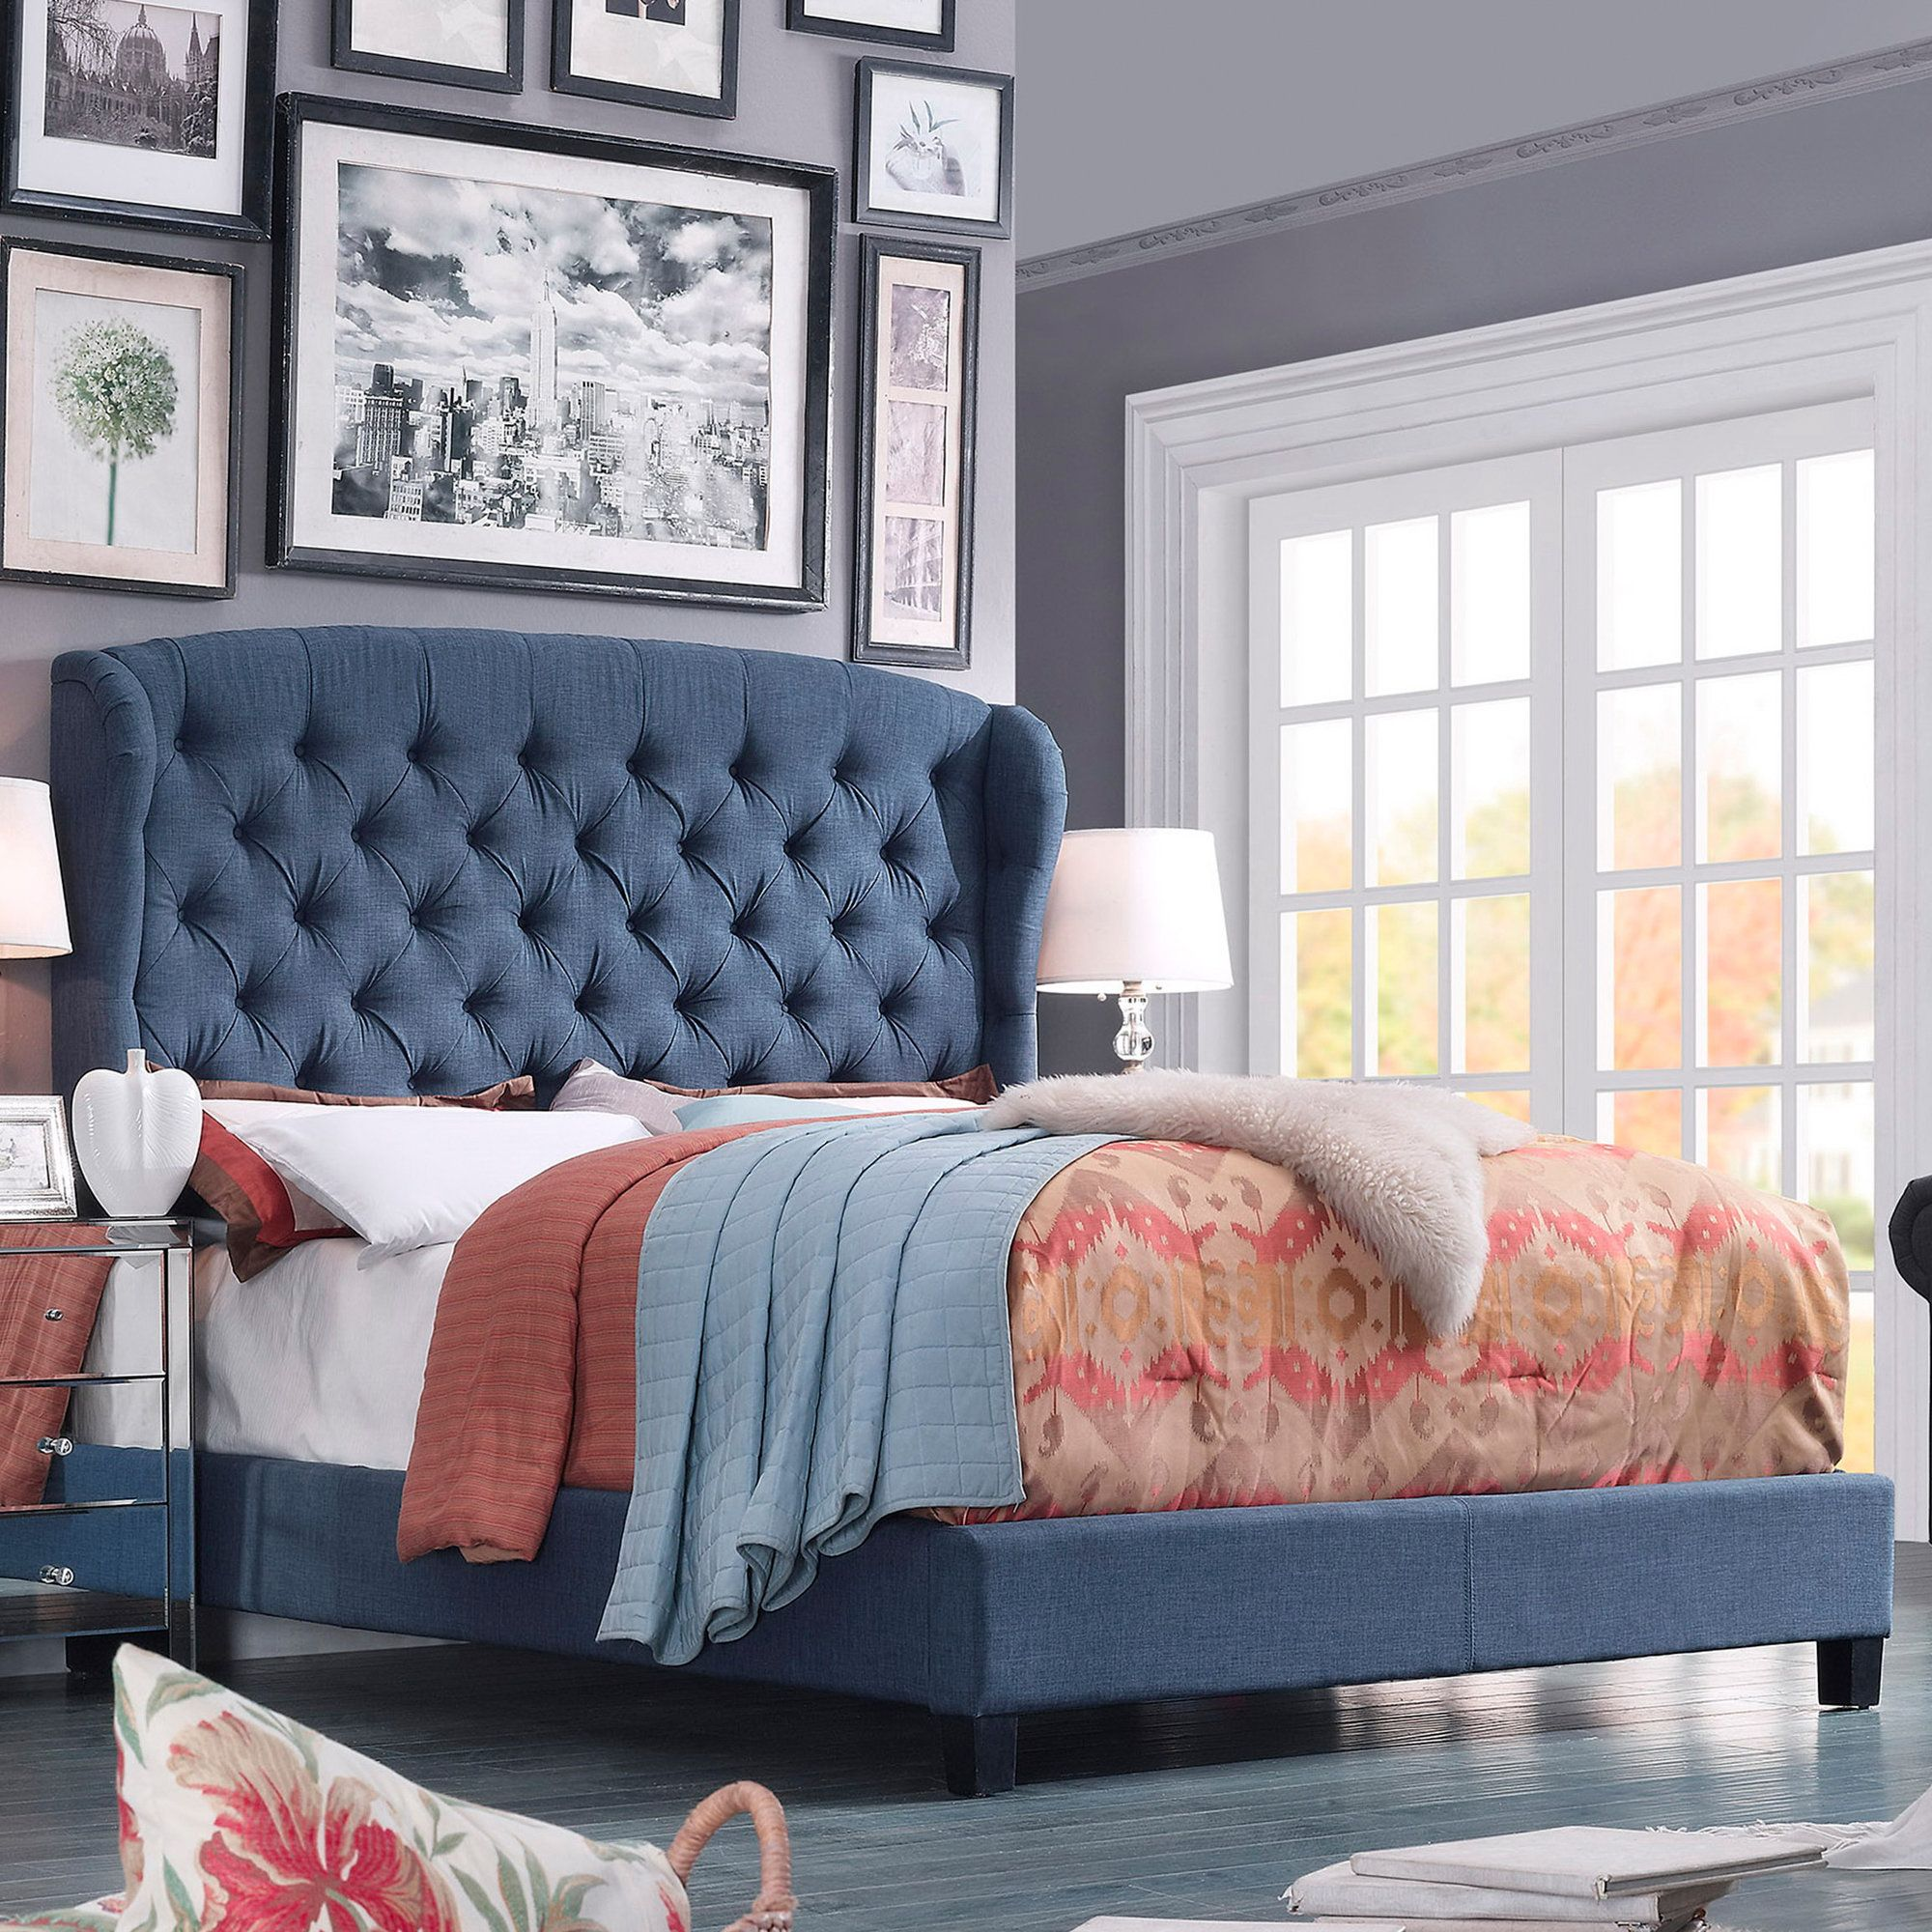 Alexia Upholstered Panel Bed Upholstered Panel Bed Bedroom Furniture For Sale Furniture